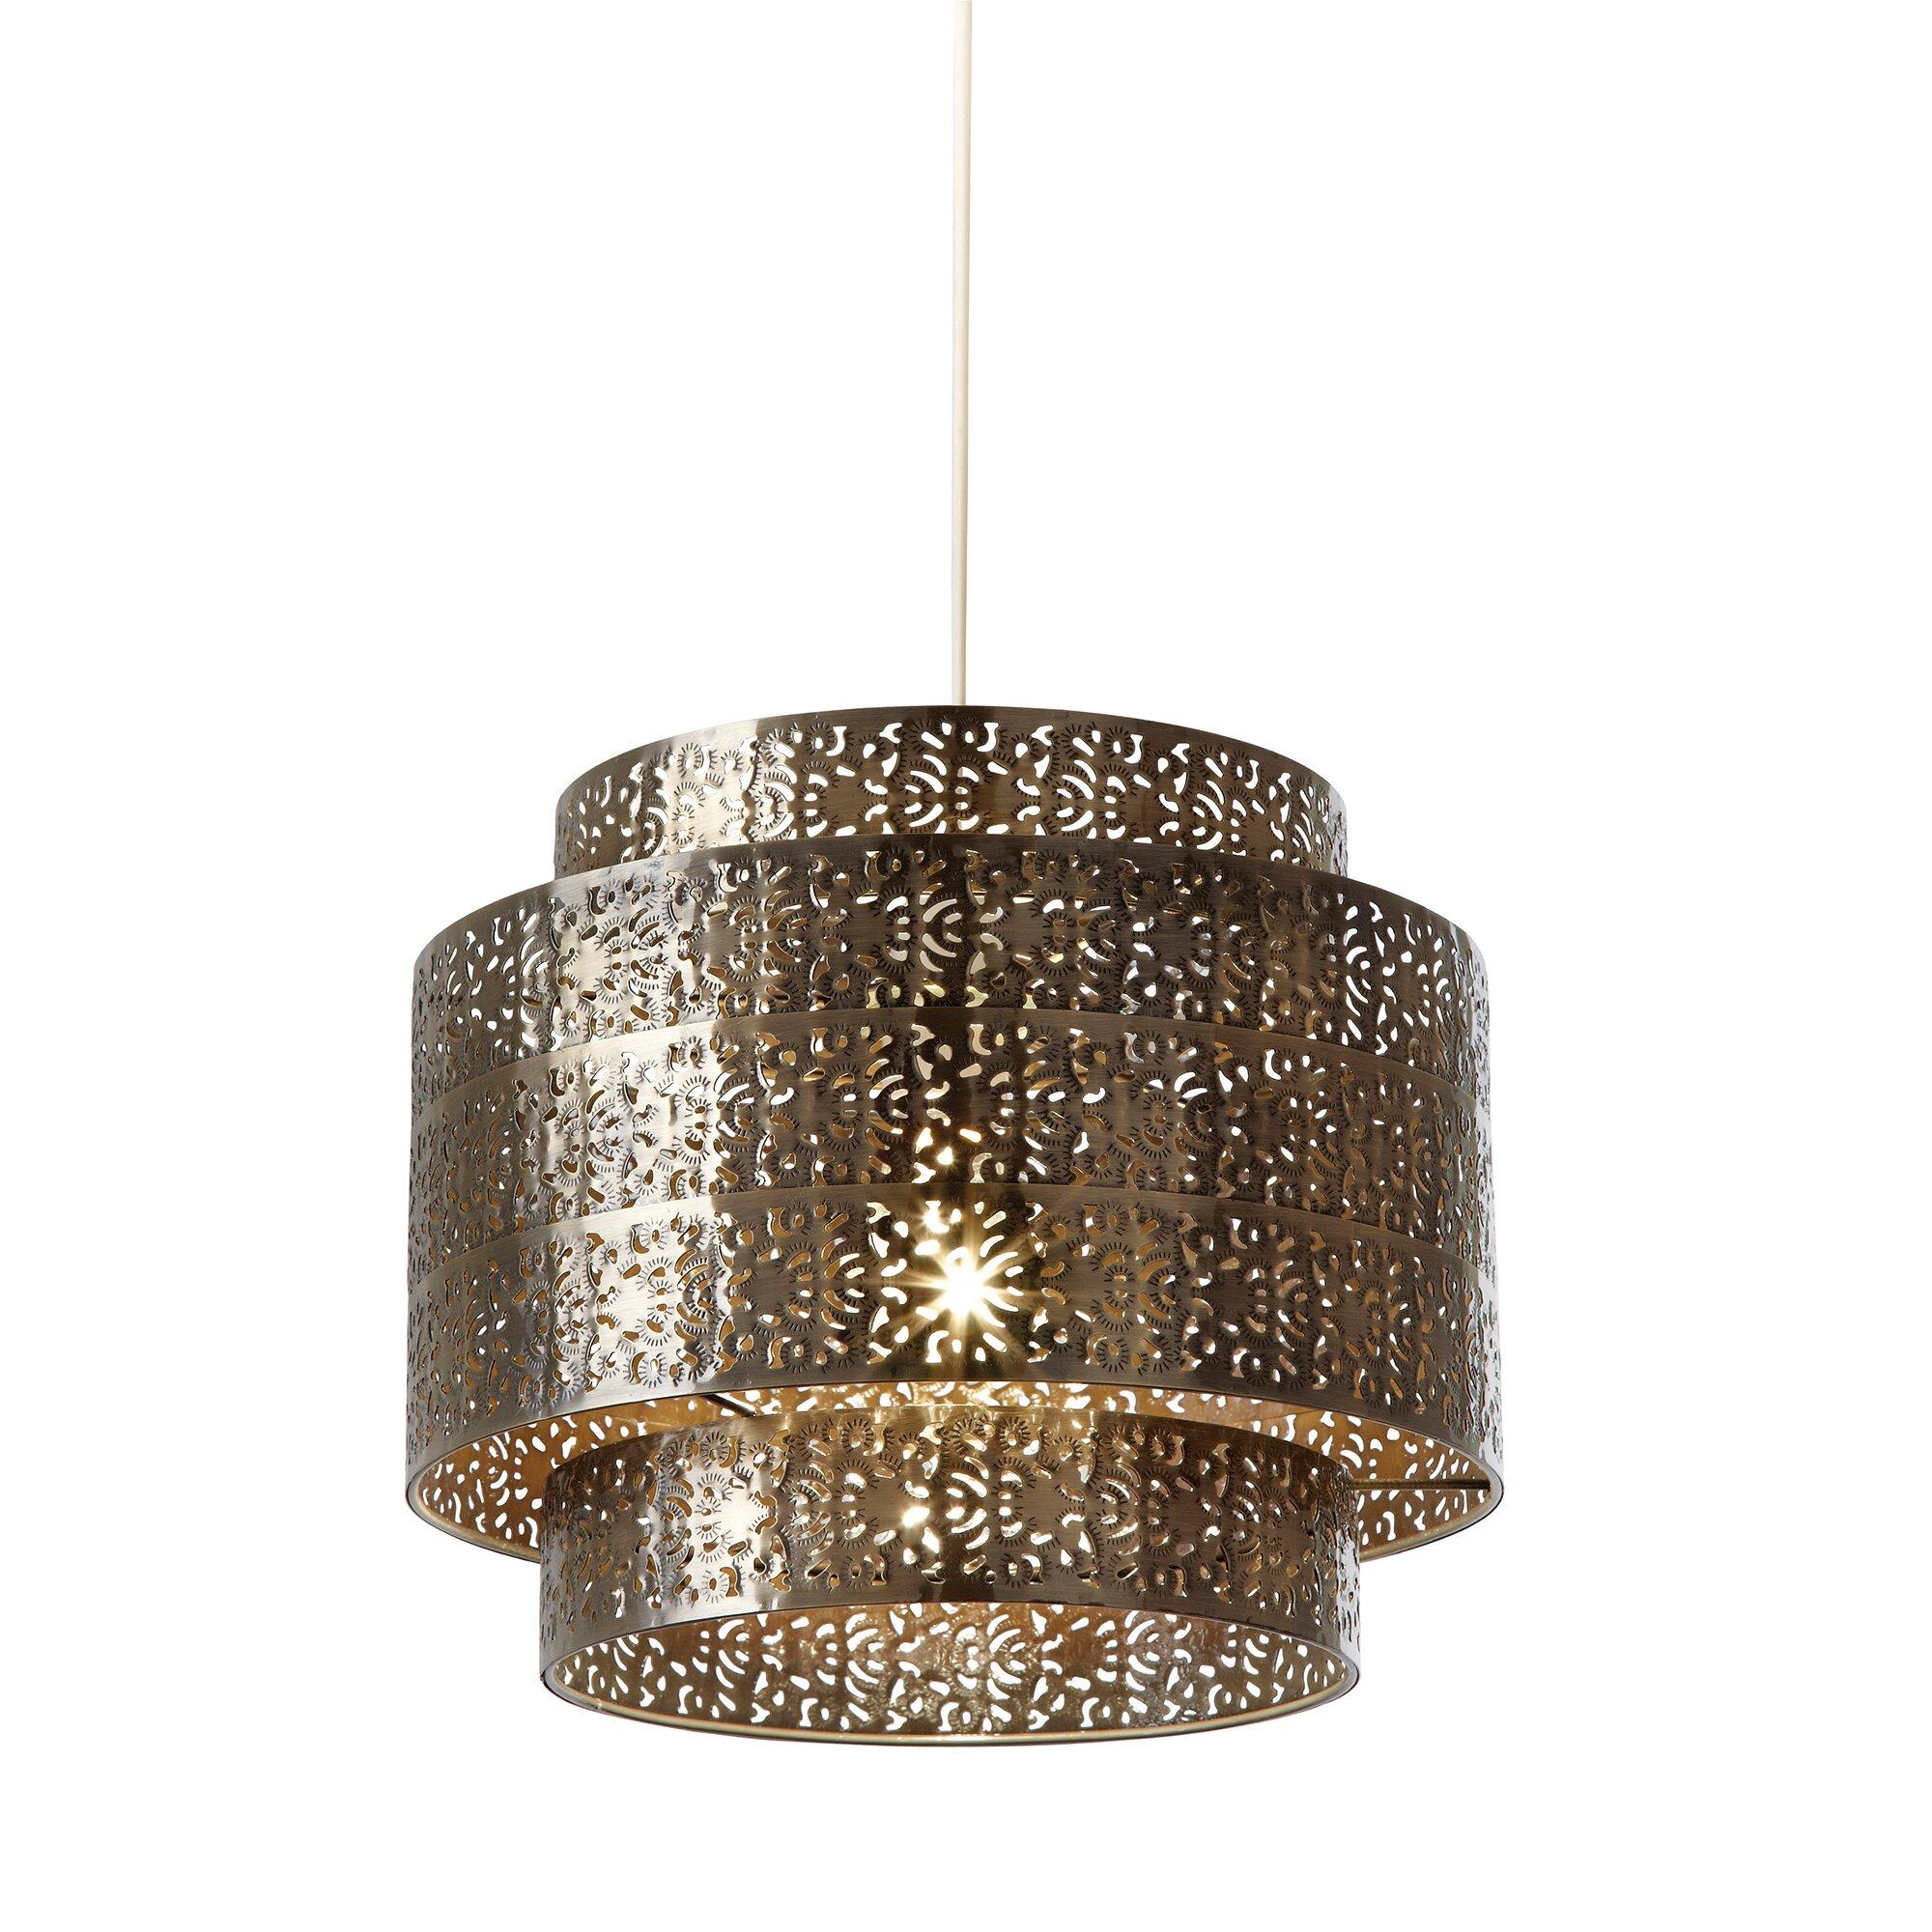 Ceiling Lamp Shades At Next: Endon Lighting 28cm Bramham Metal Drum Pendant Shade